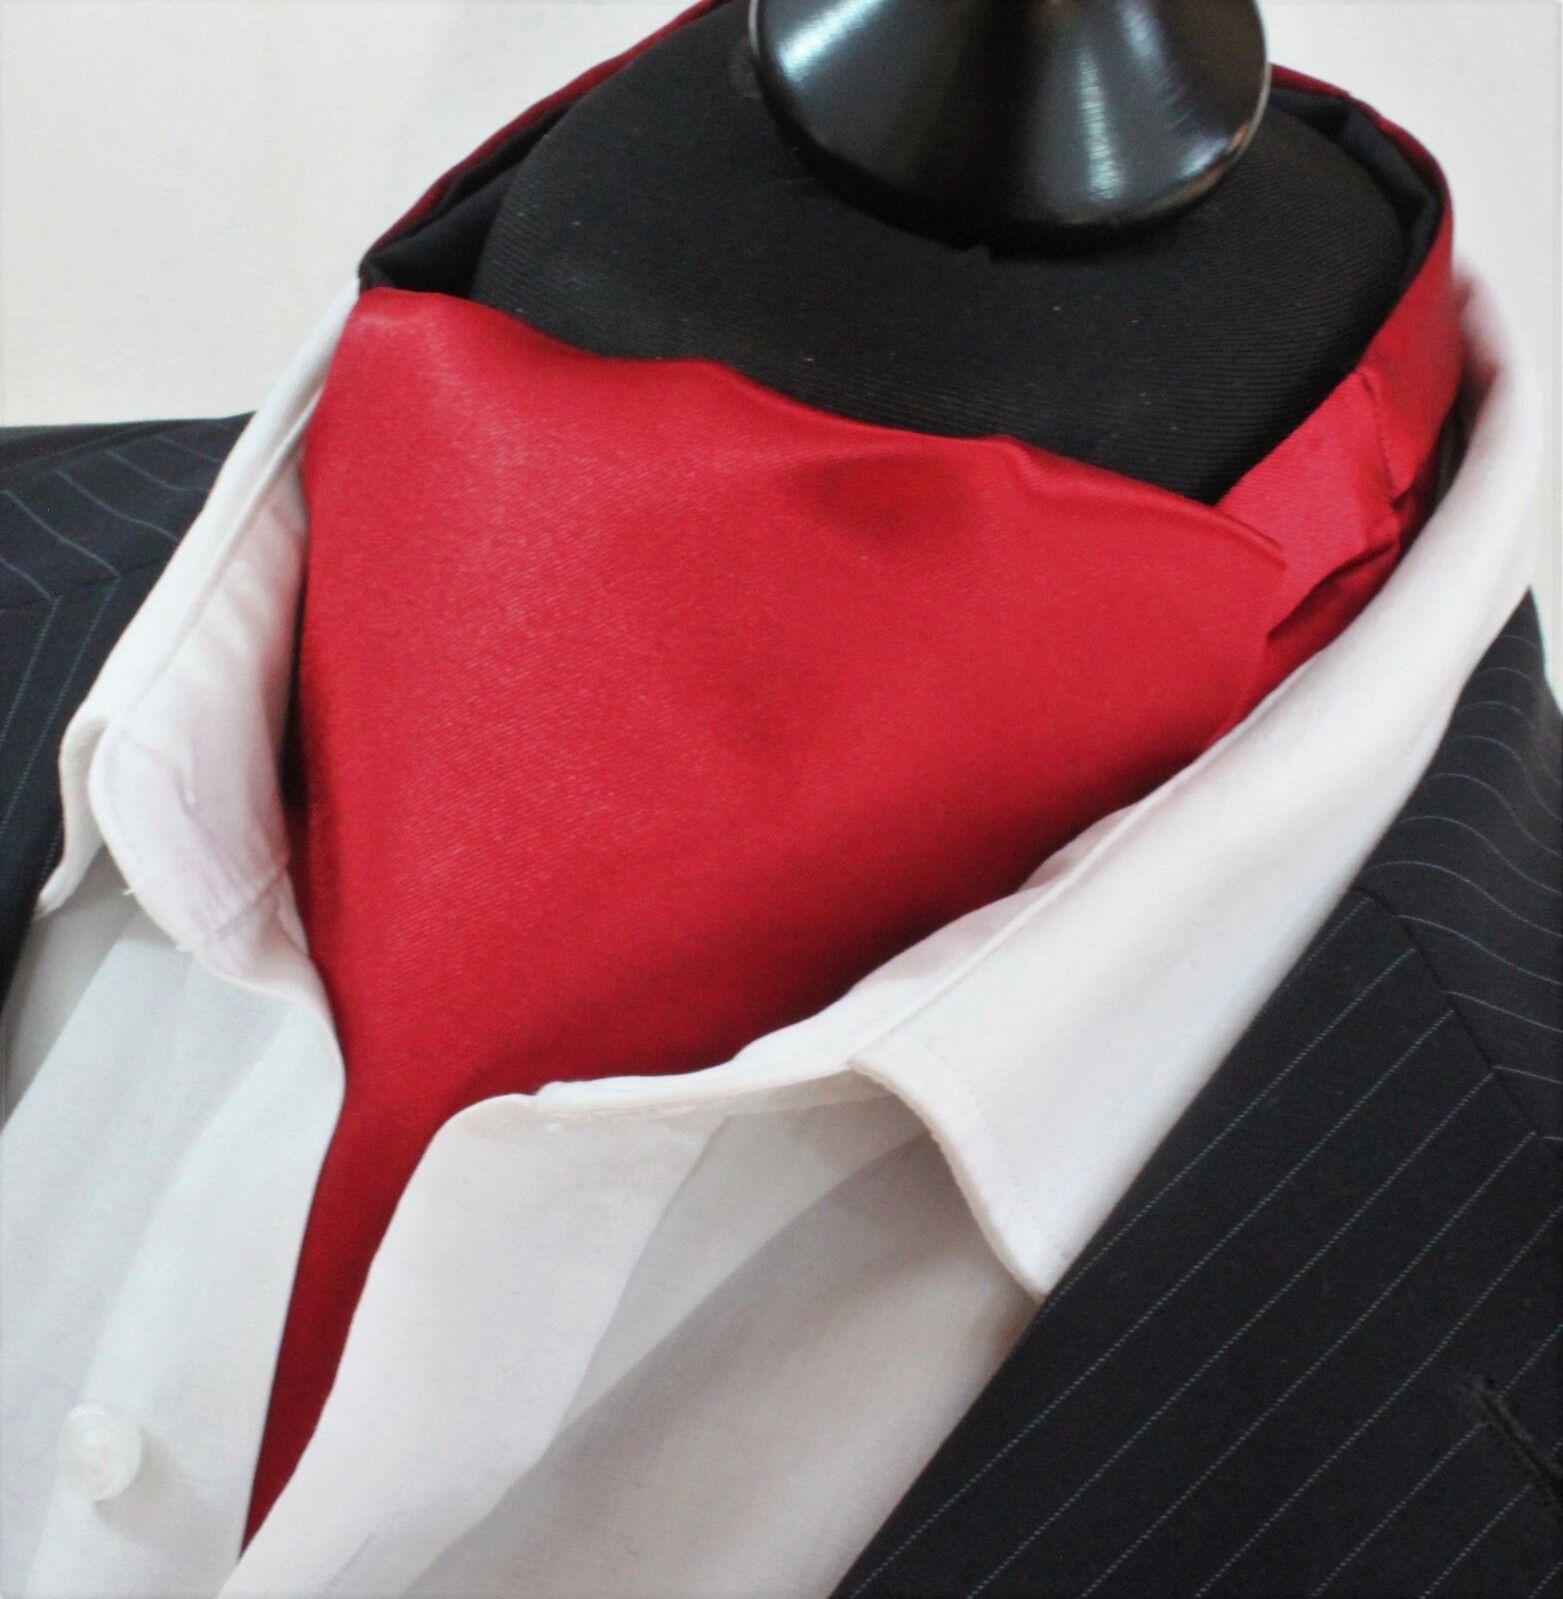 Cravat Ascot+ Hanky SILKY Deep Red SATIN UK MADE